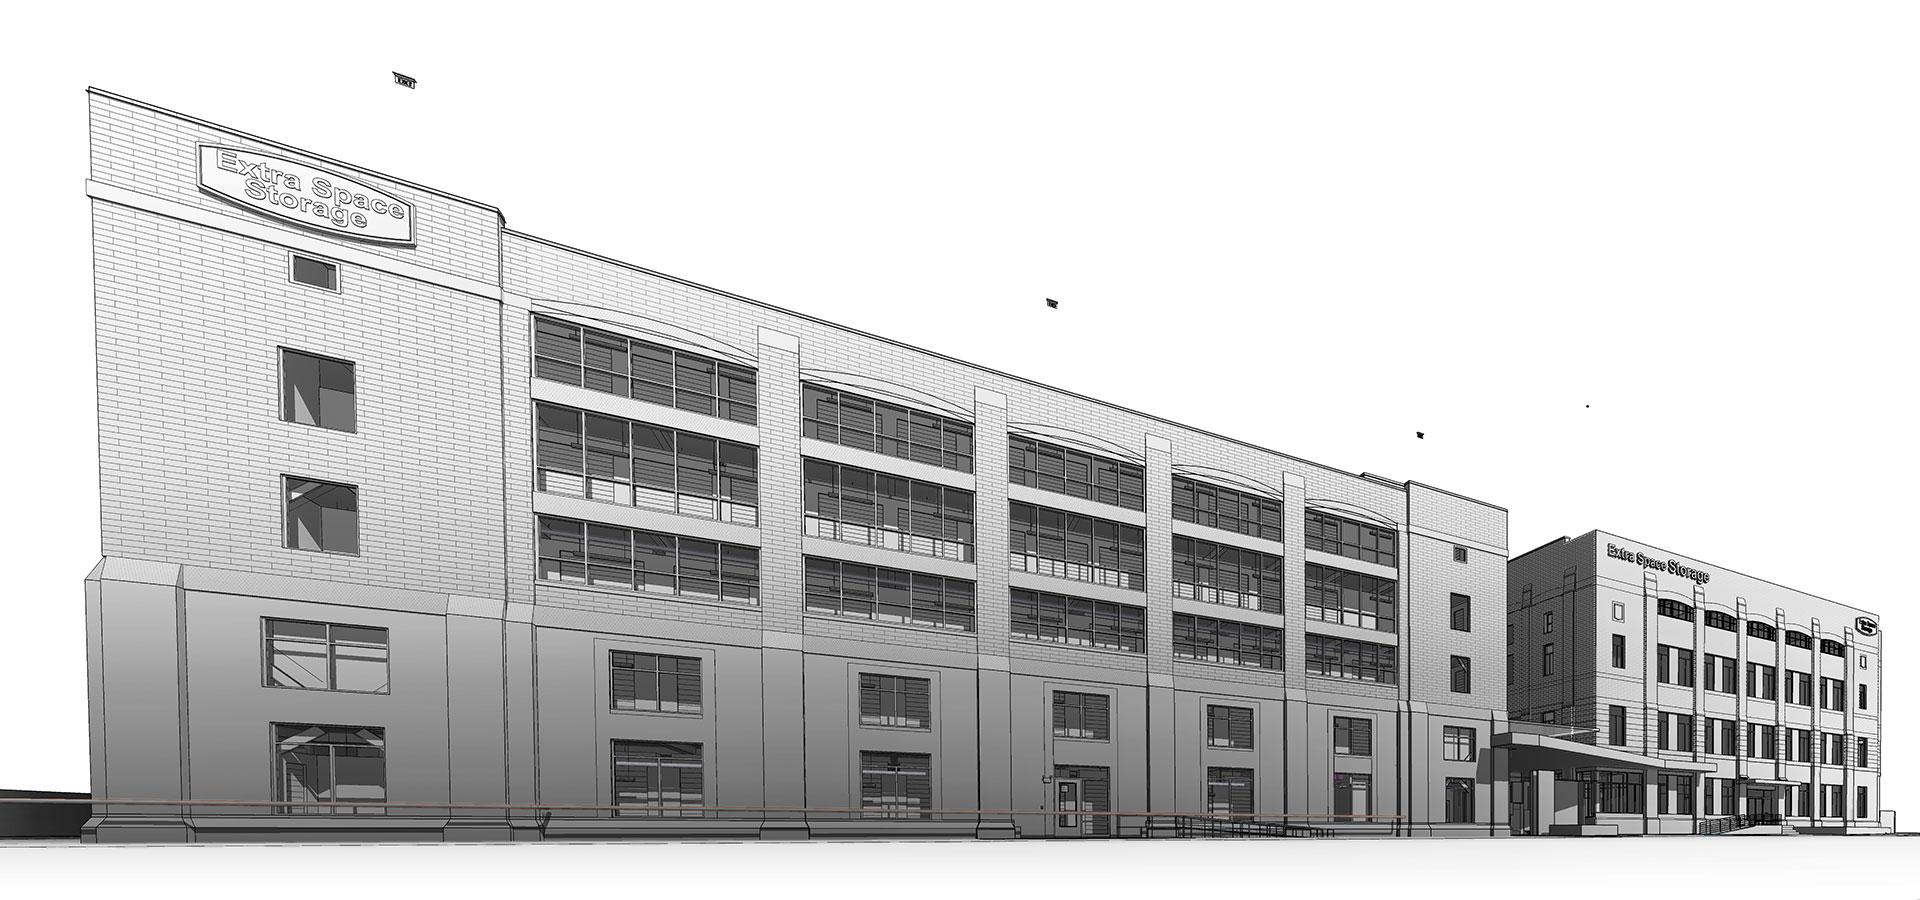 3D-Architecture-BIM-Model-Commercial-Revit-Modeling-by-United-BIM